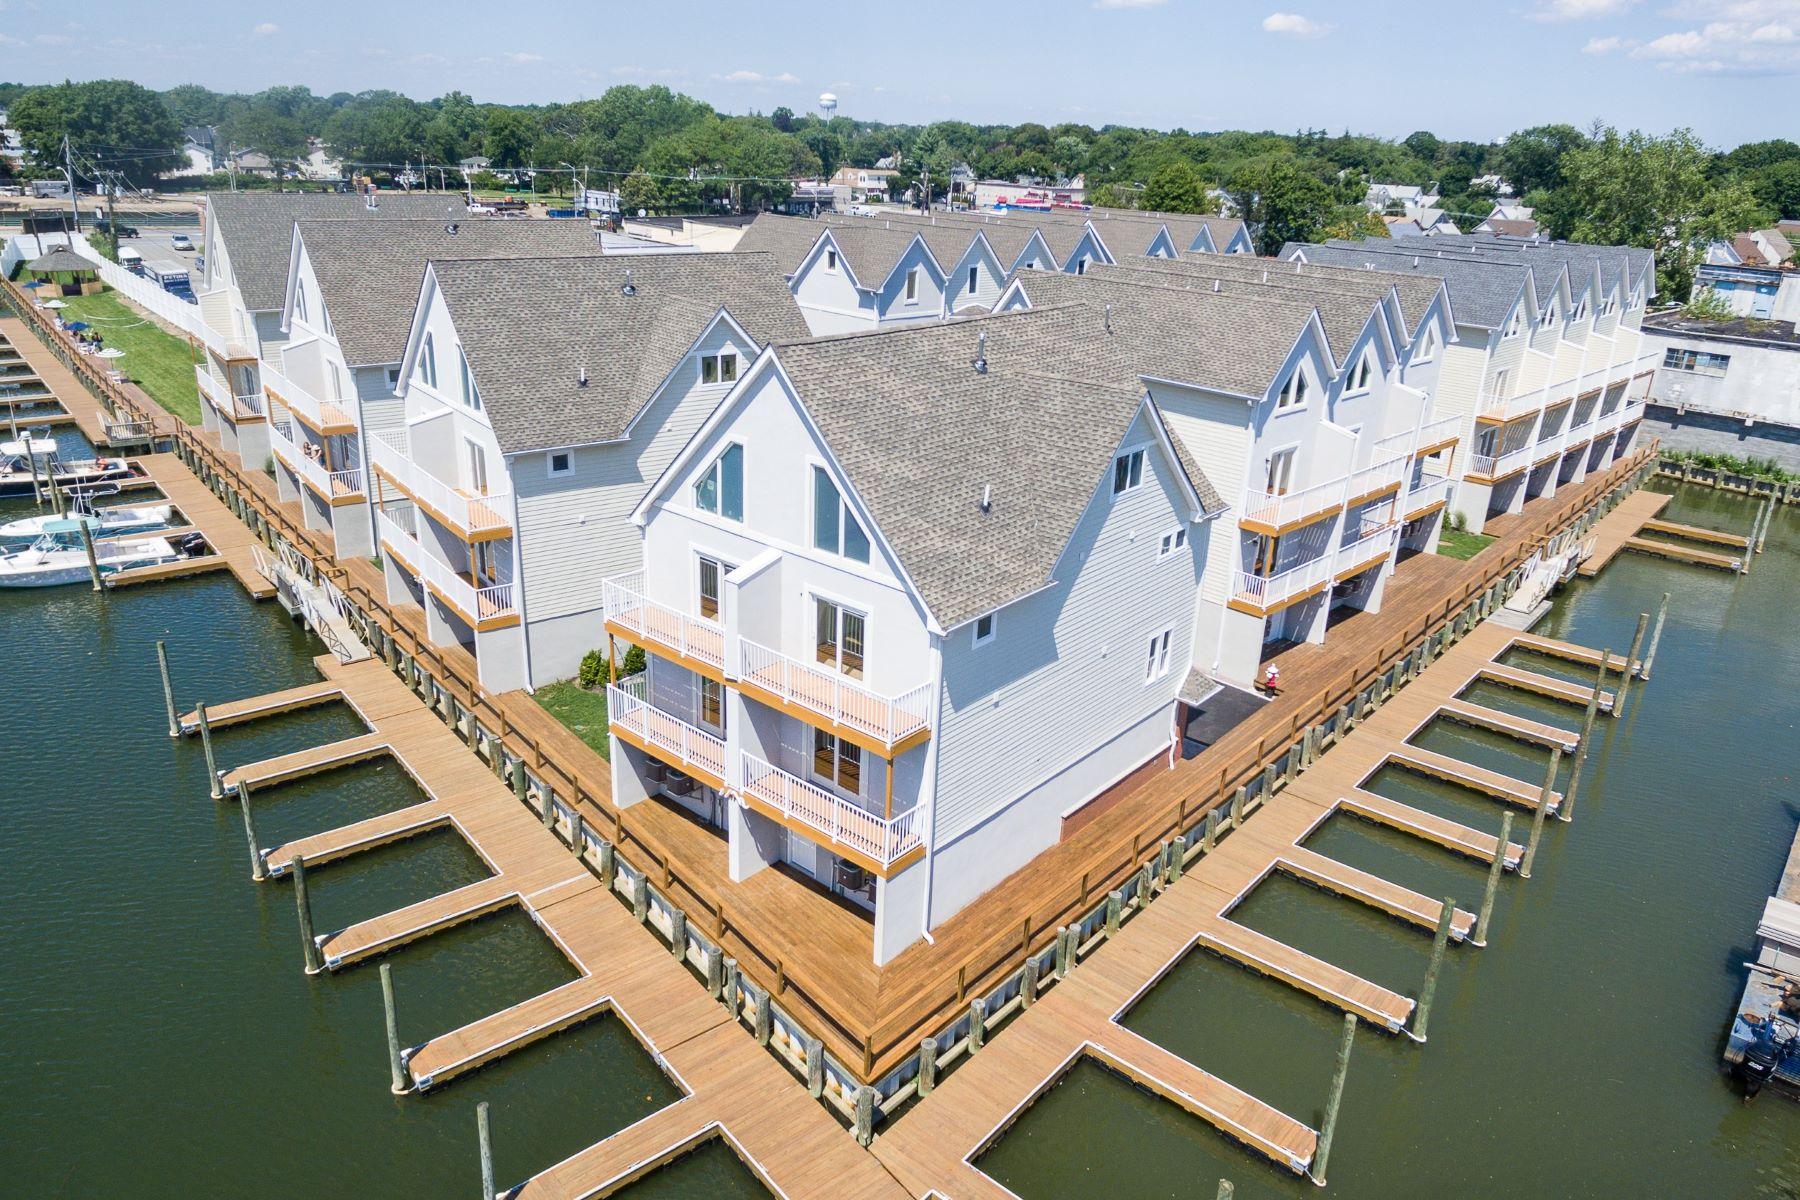 Condominium for Sale at Condo 531 Ray St 22 Freeport, New York 11520 United States